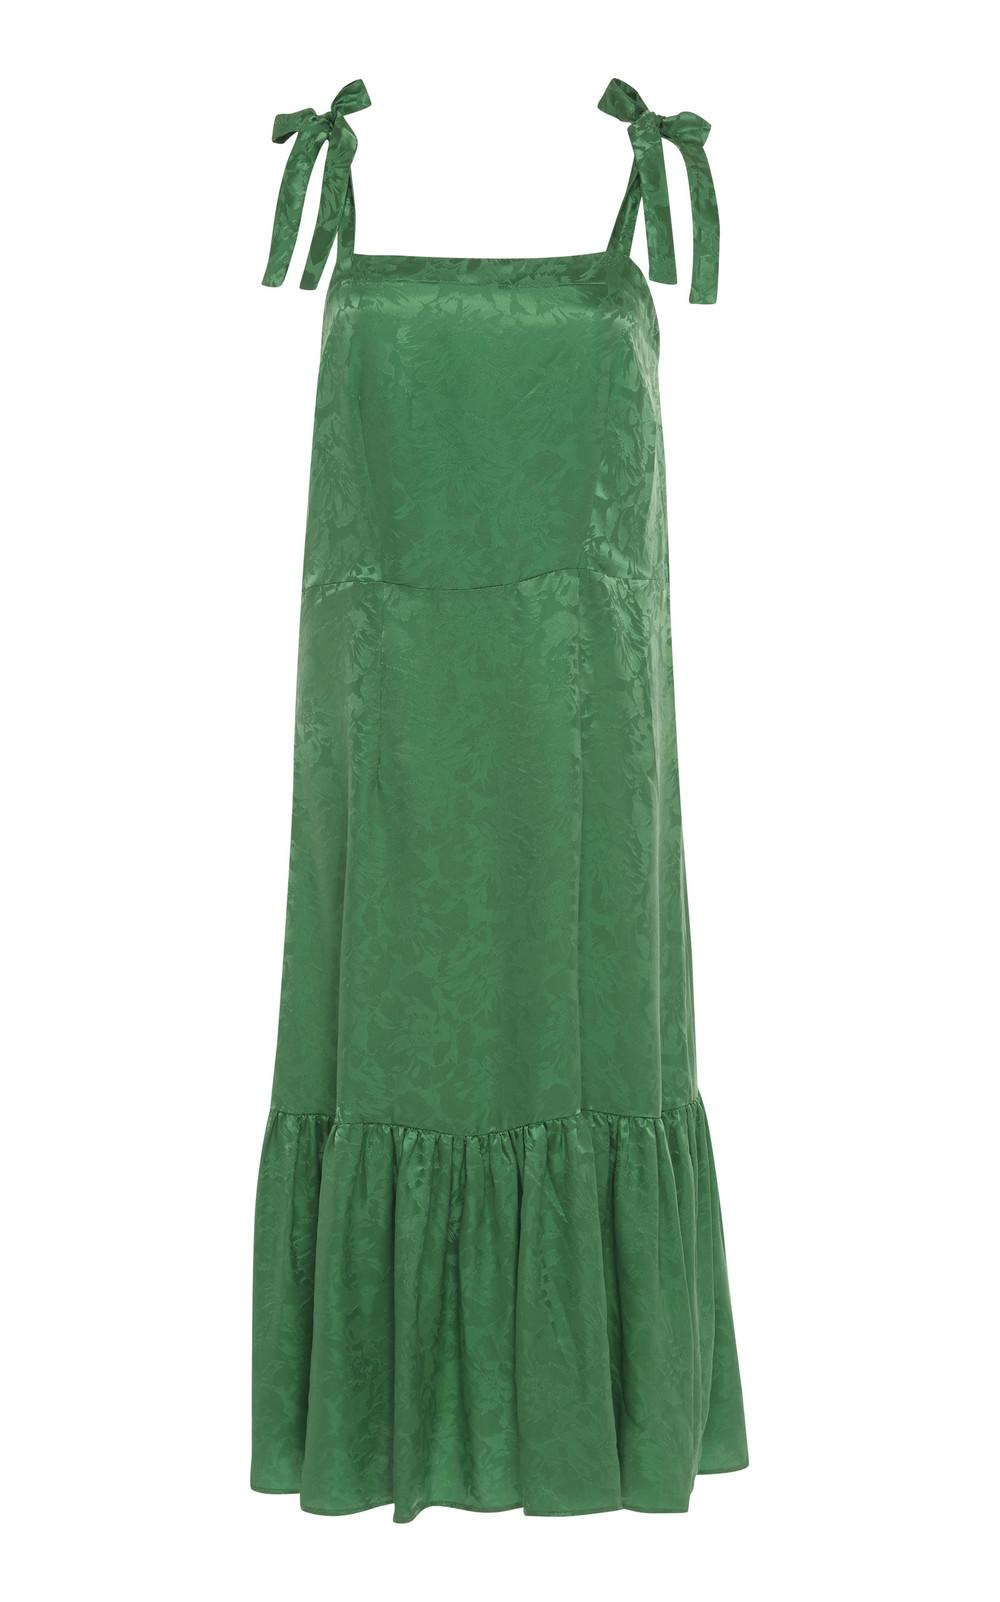 Warm Centre Jacquard Shoulder-Tie Dress in green